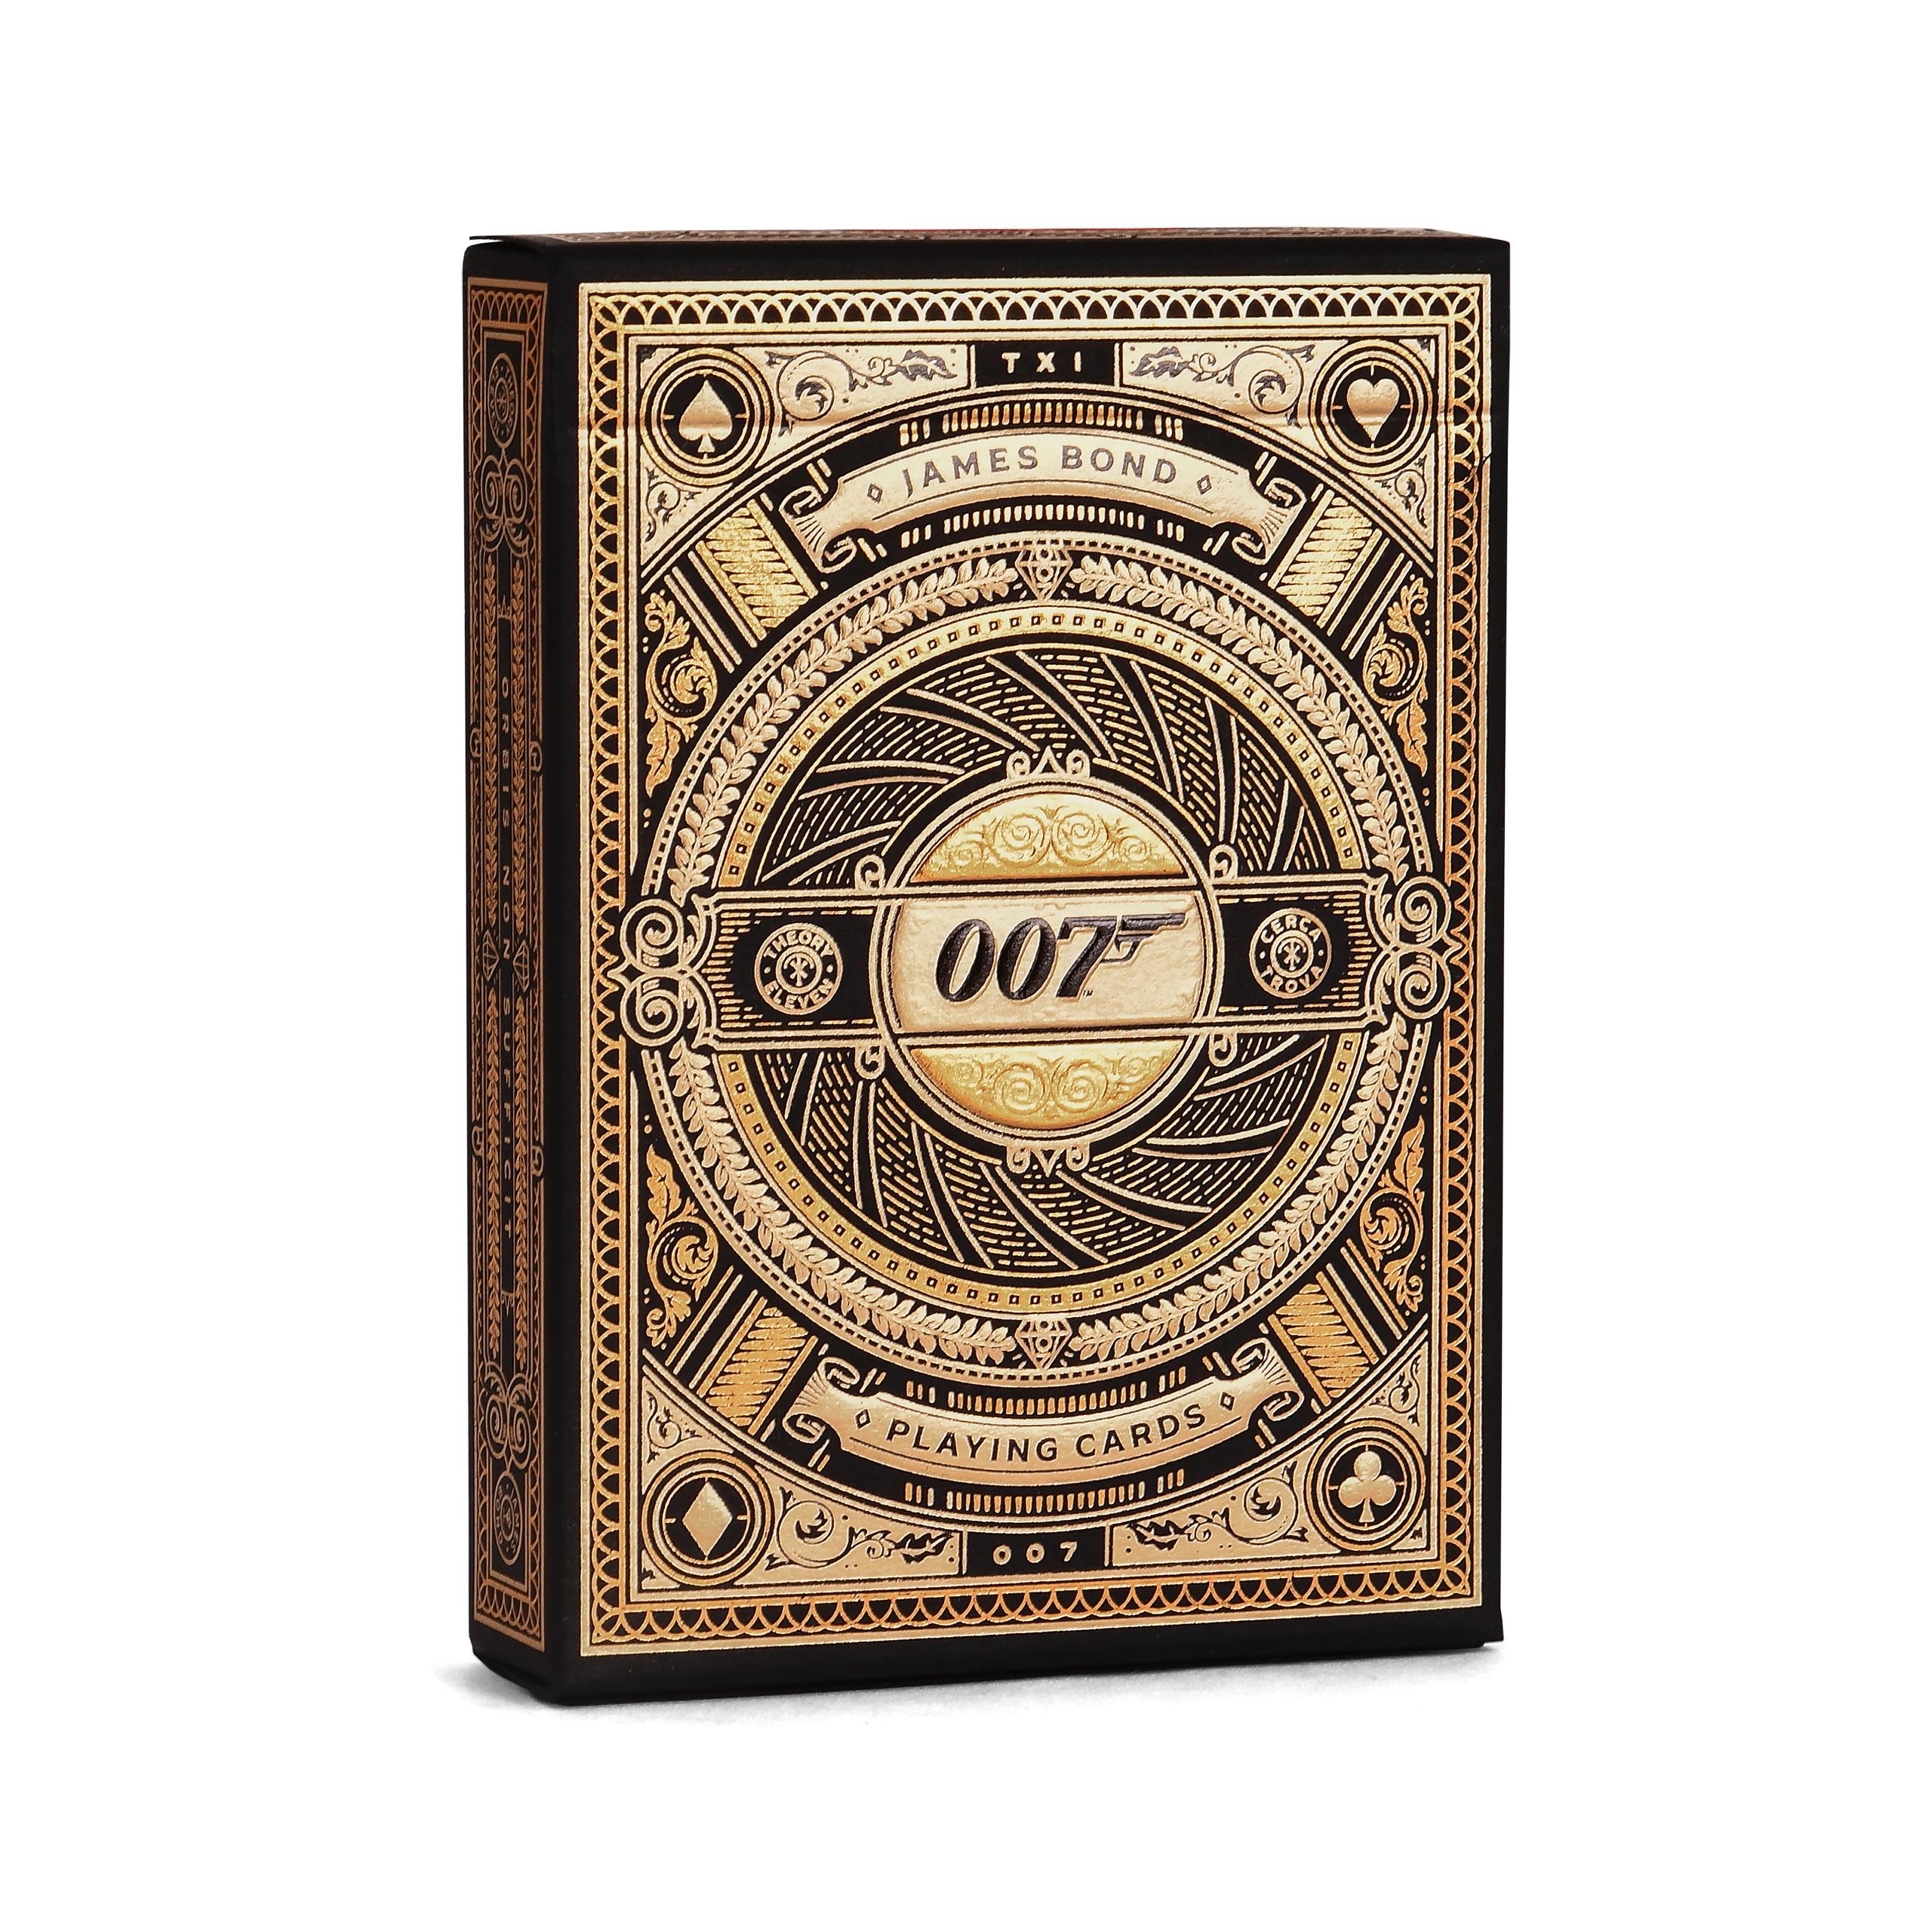 James Bond 007 Kartenspiel